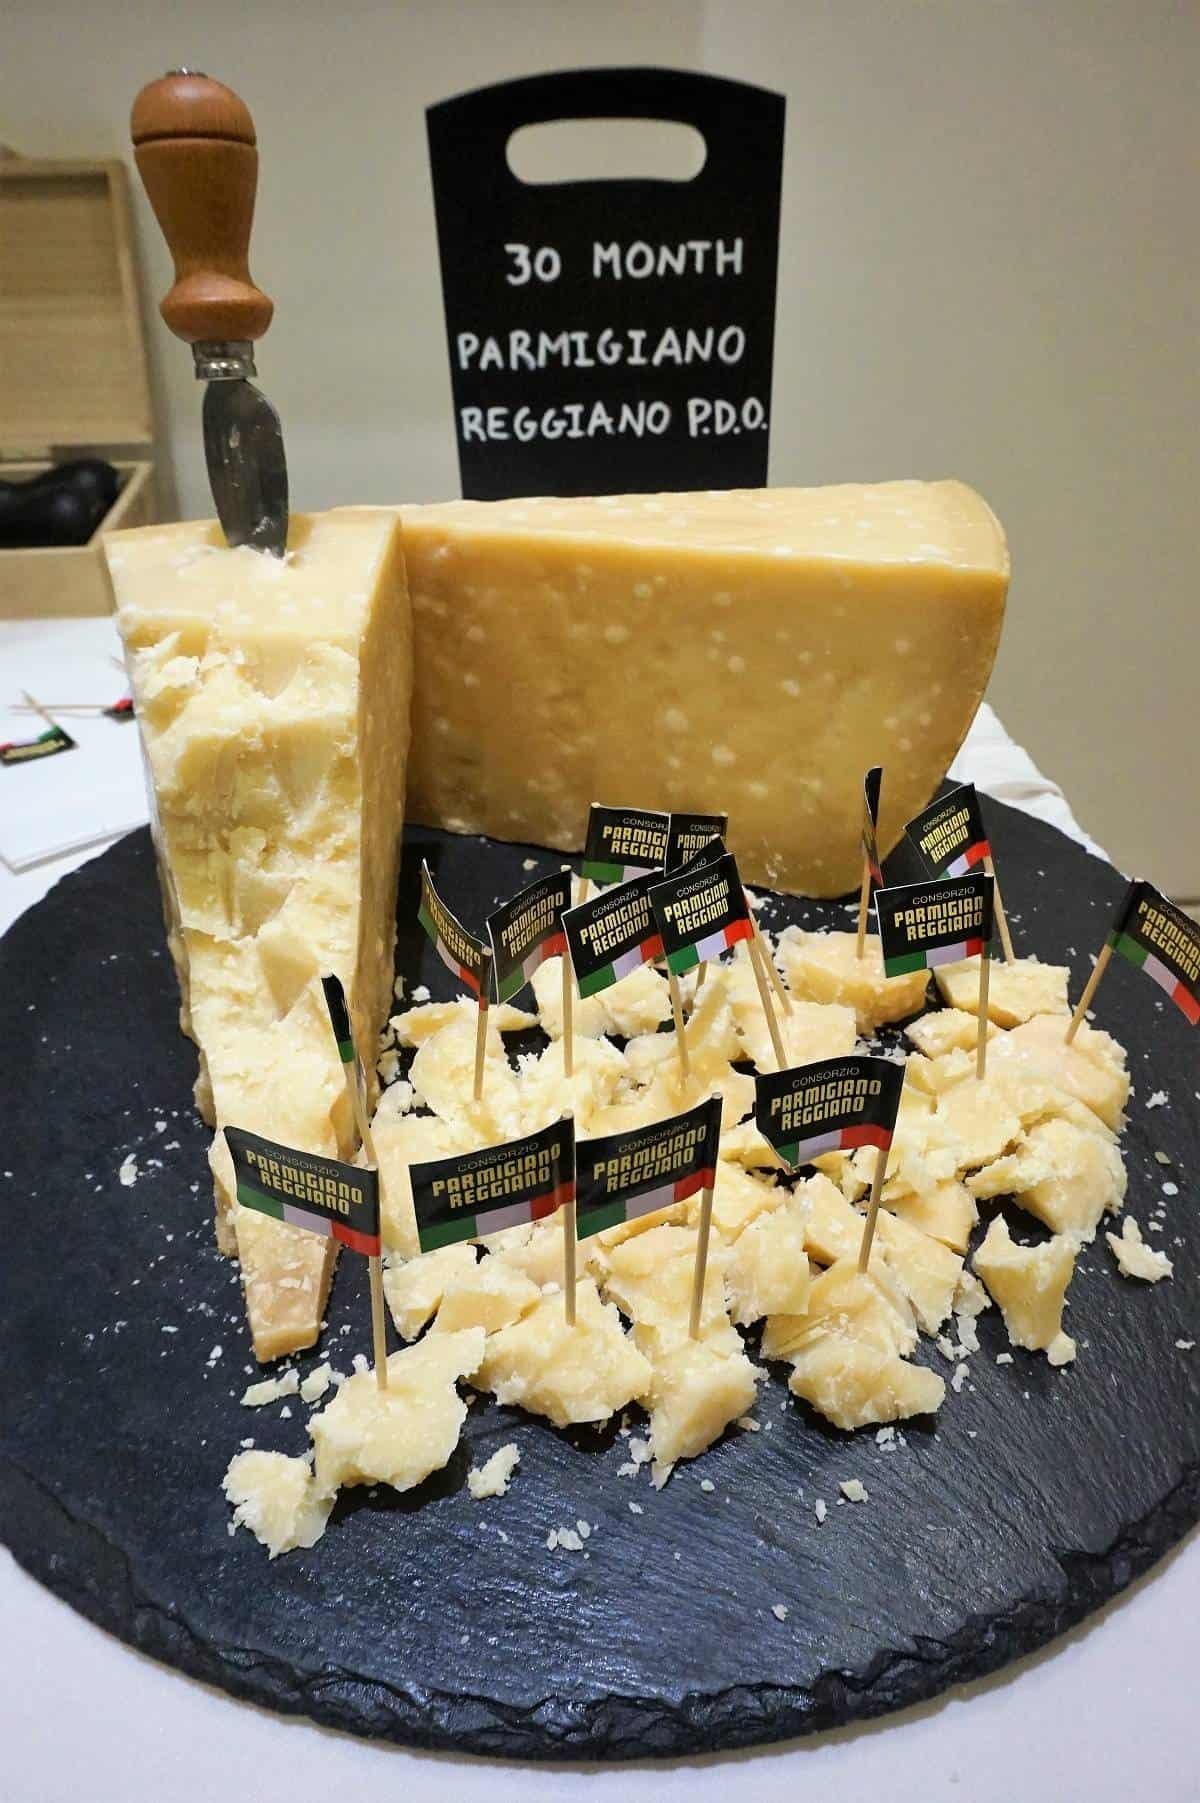 Chunk of parmigiano reggiano